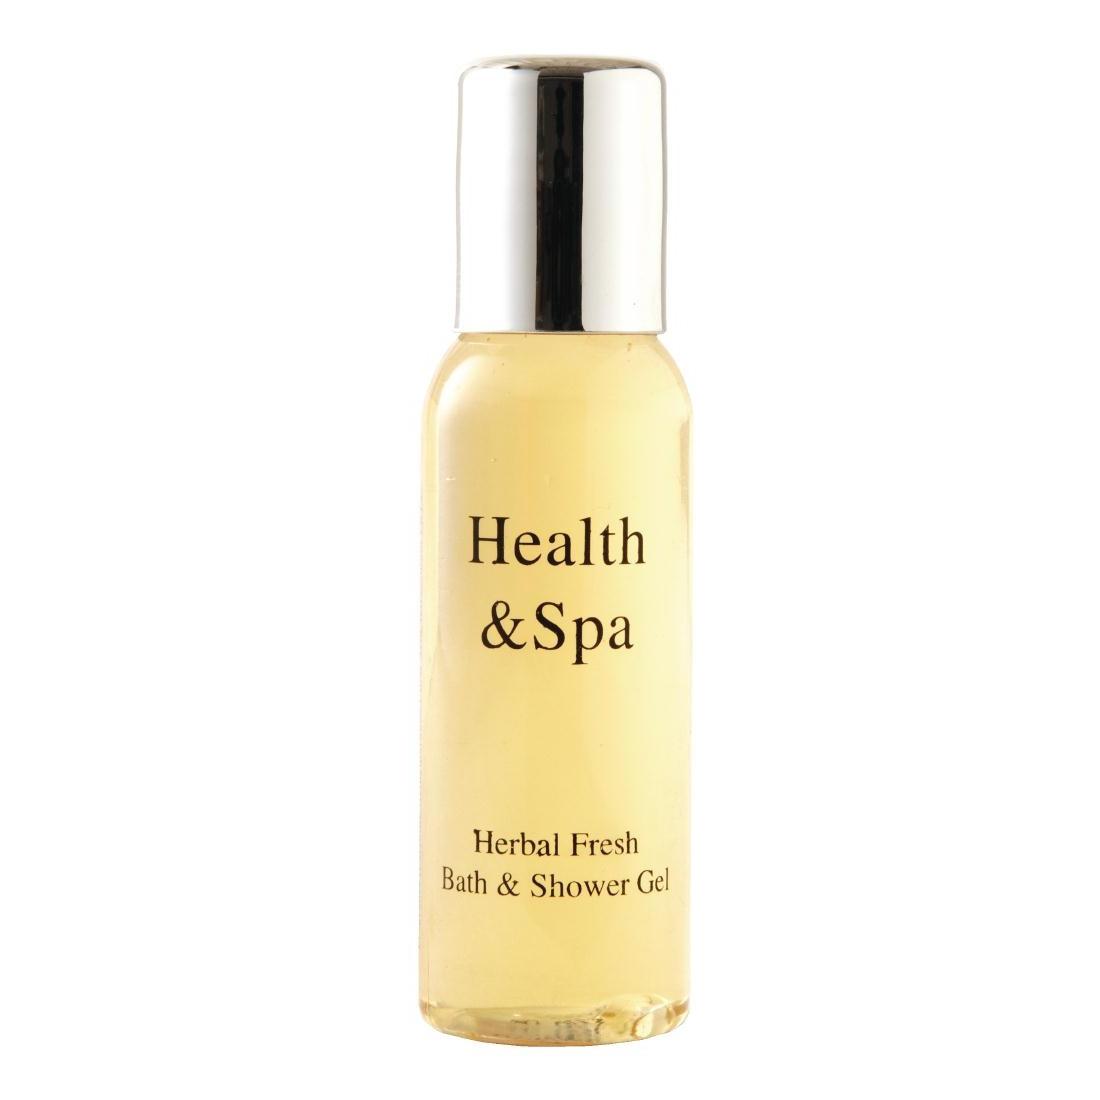 Health & Spa Range Herbal Fresh Bath and Shower Gel | Complimentary ...